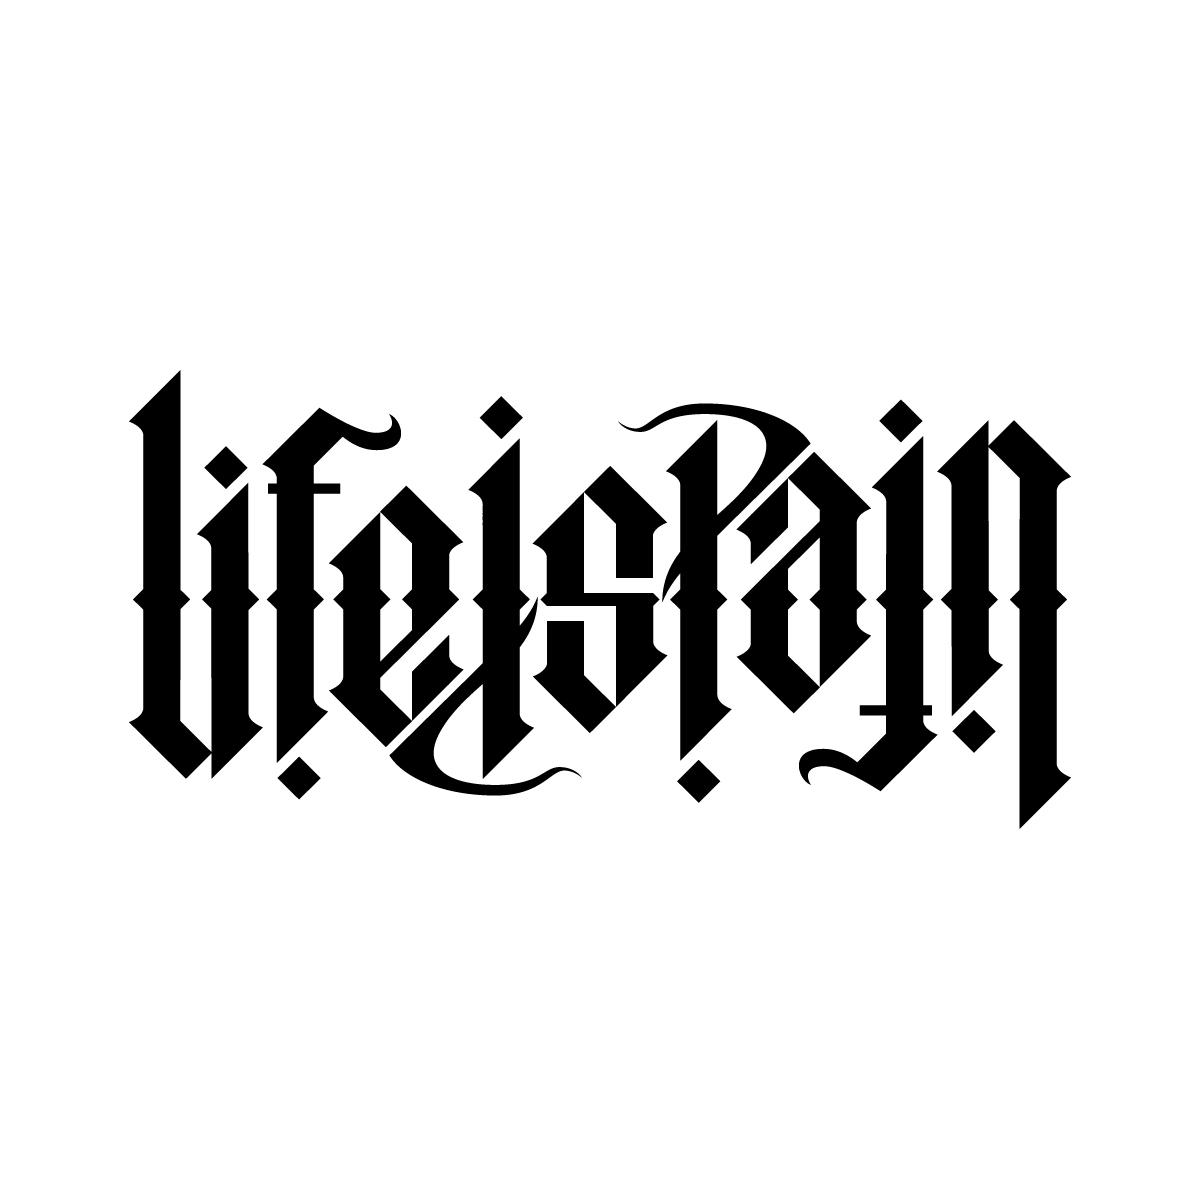 45 Ambigram Tattoos Designs & Meanings - For Men & Women (2019) - Ambigram Generator Free Printable